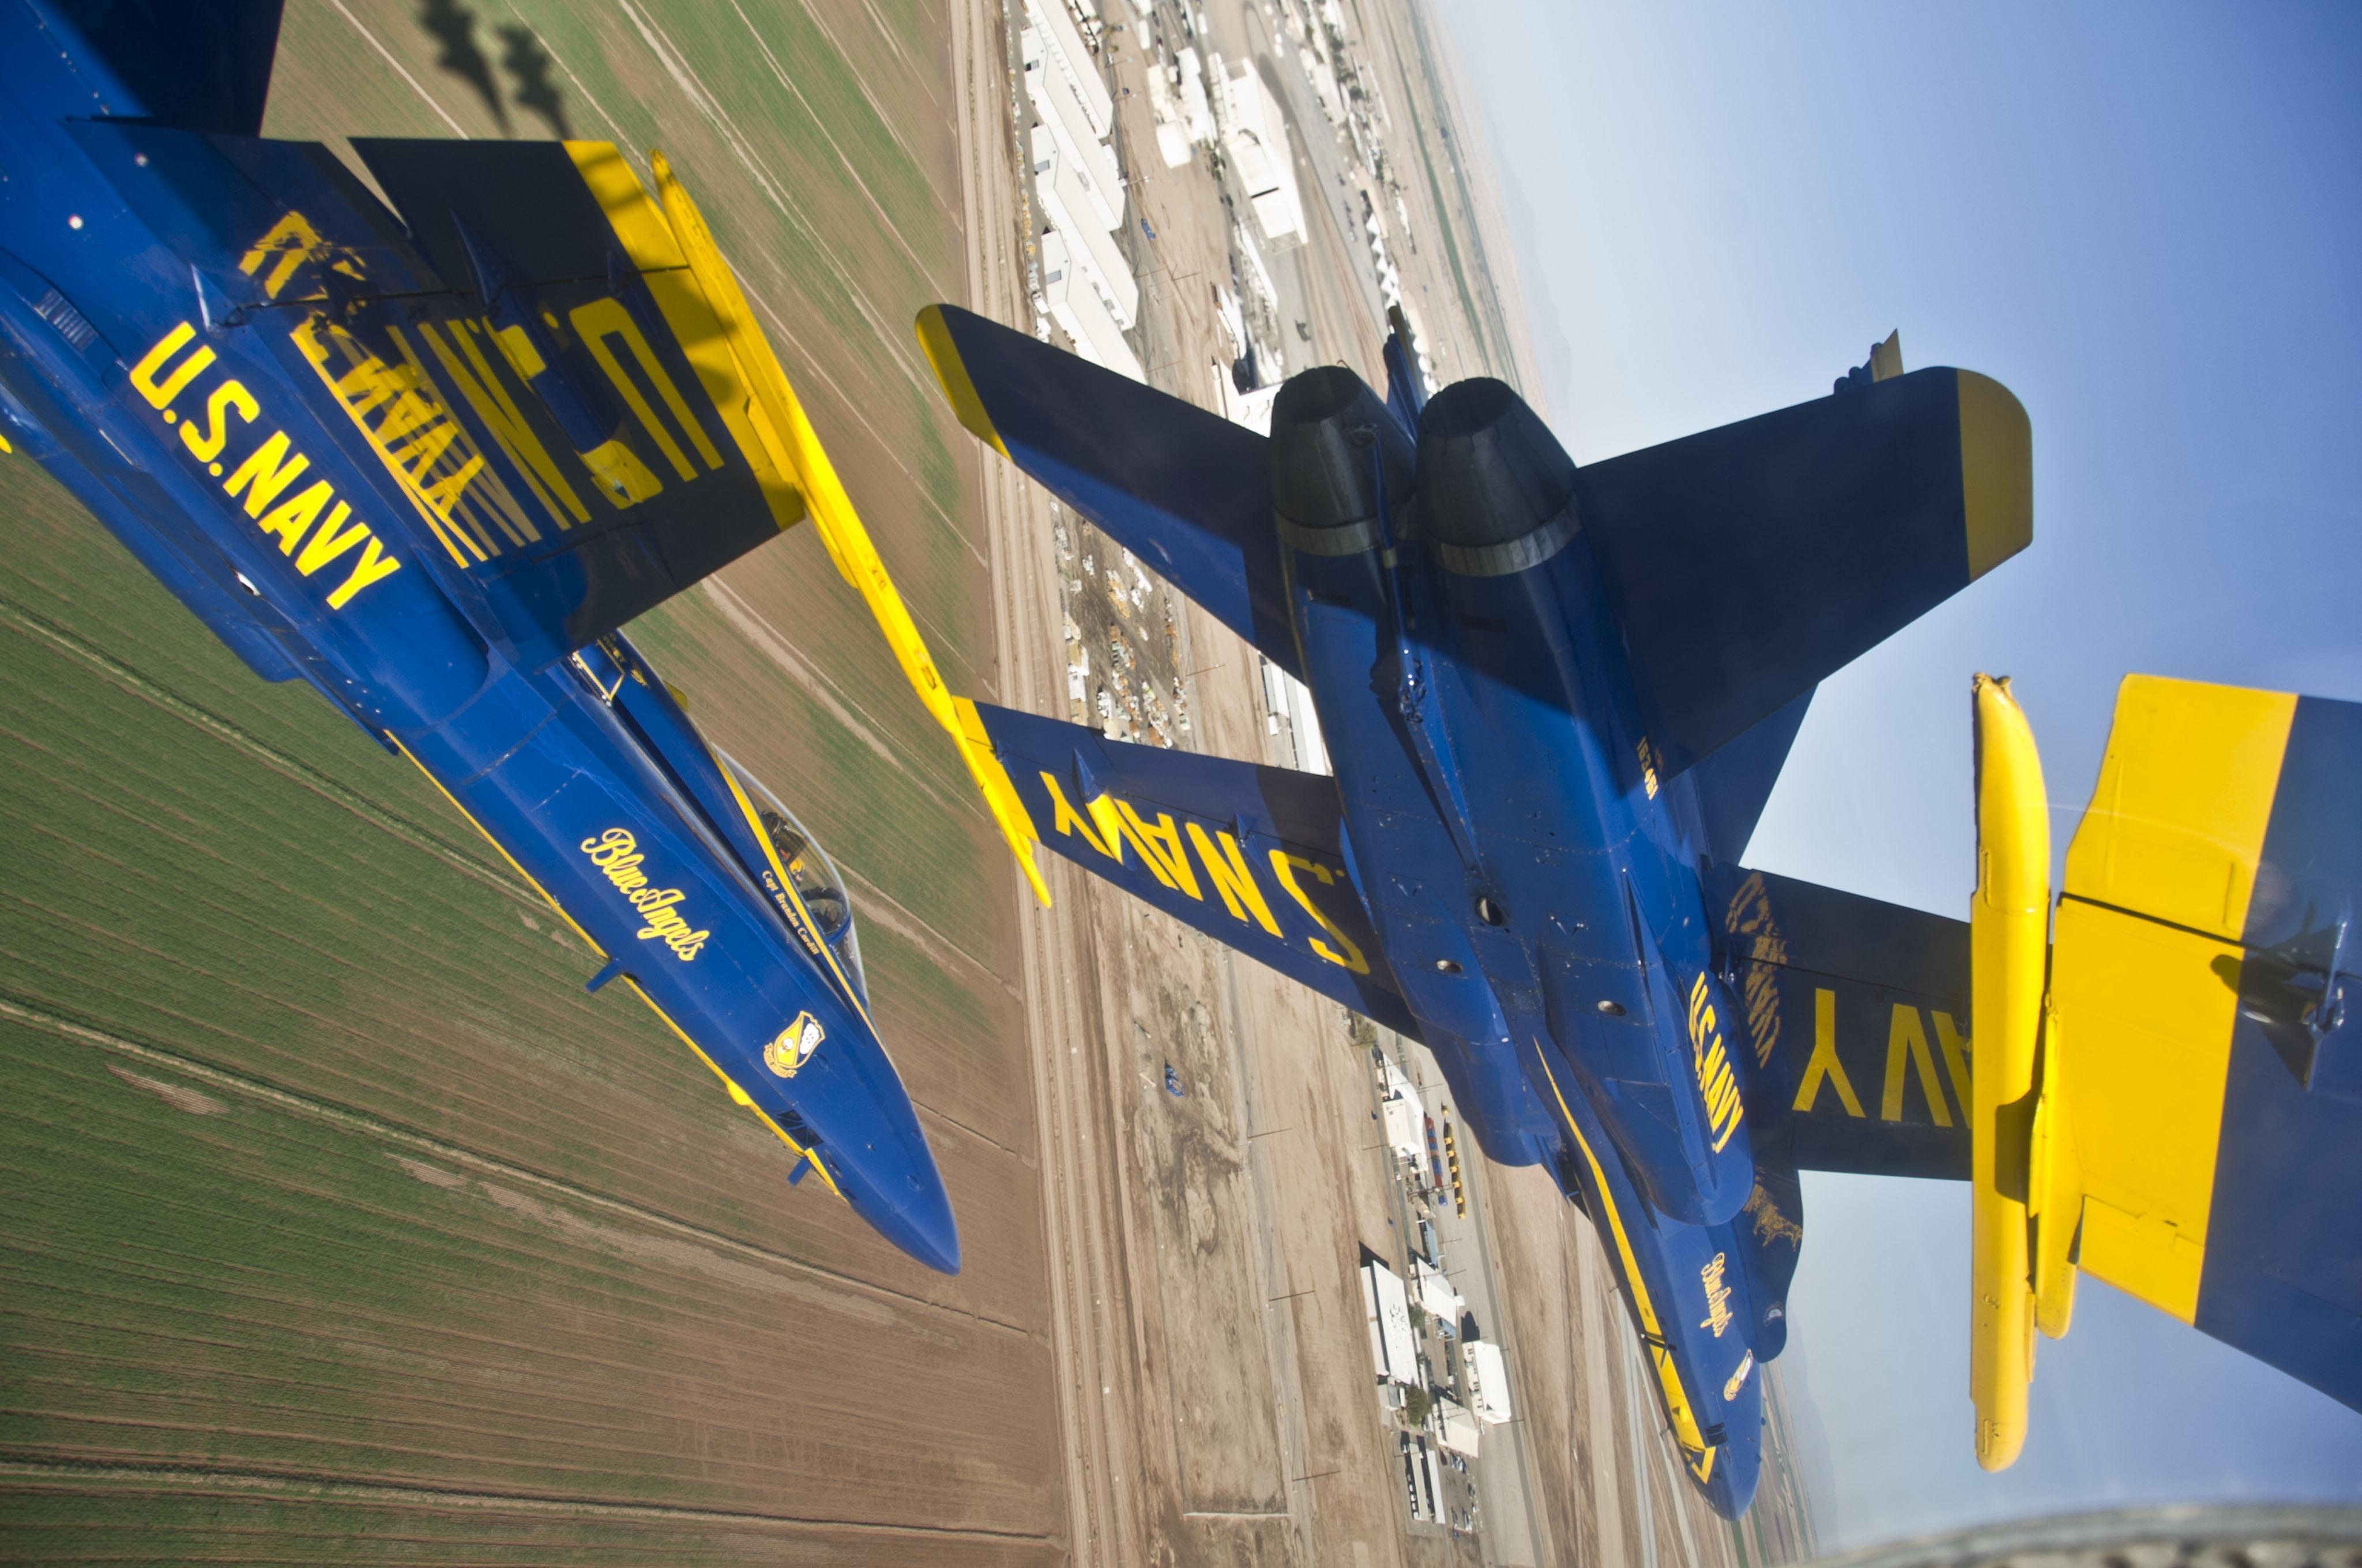 Fotos gratis : ala, cielo, suelo, aeronave, vehículo, aviación ...